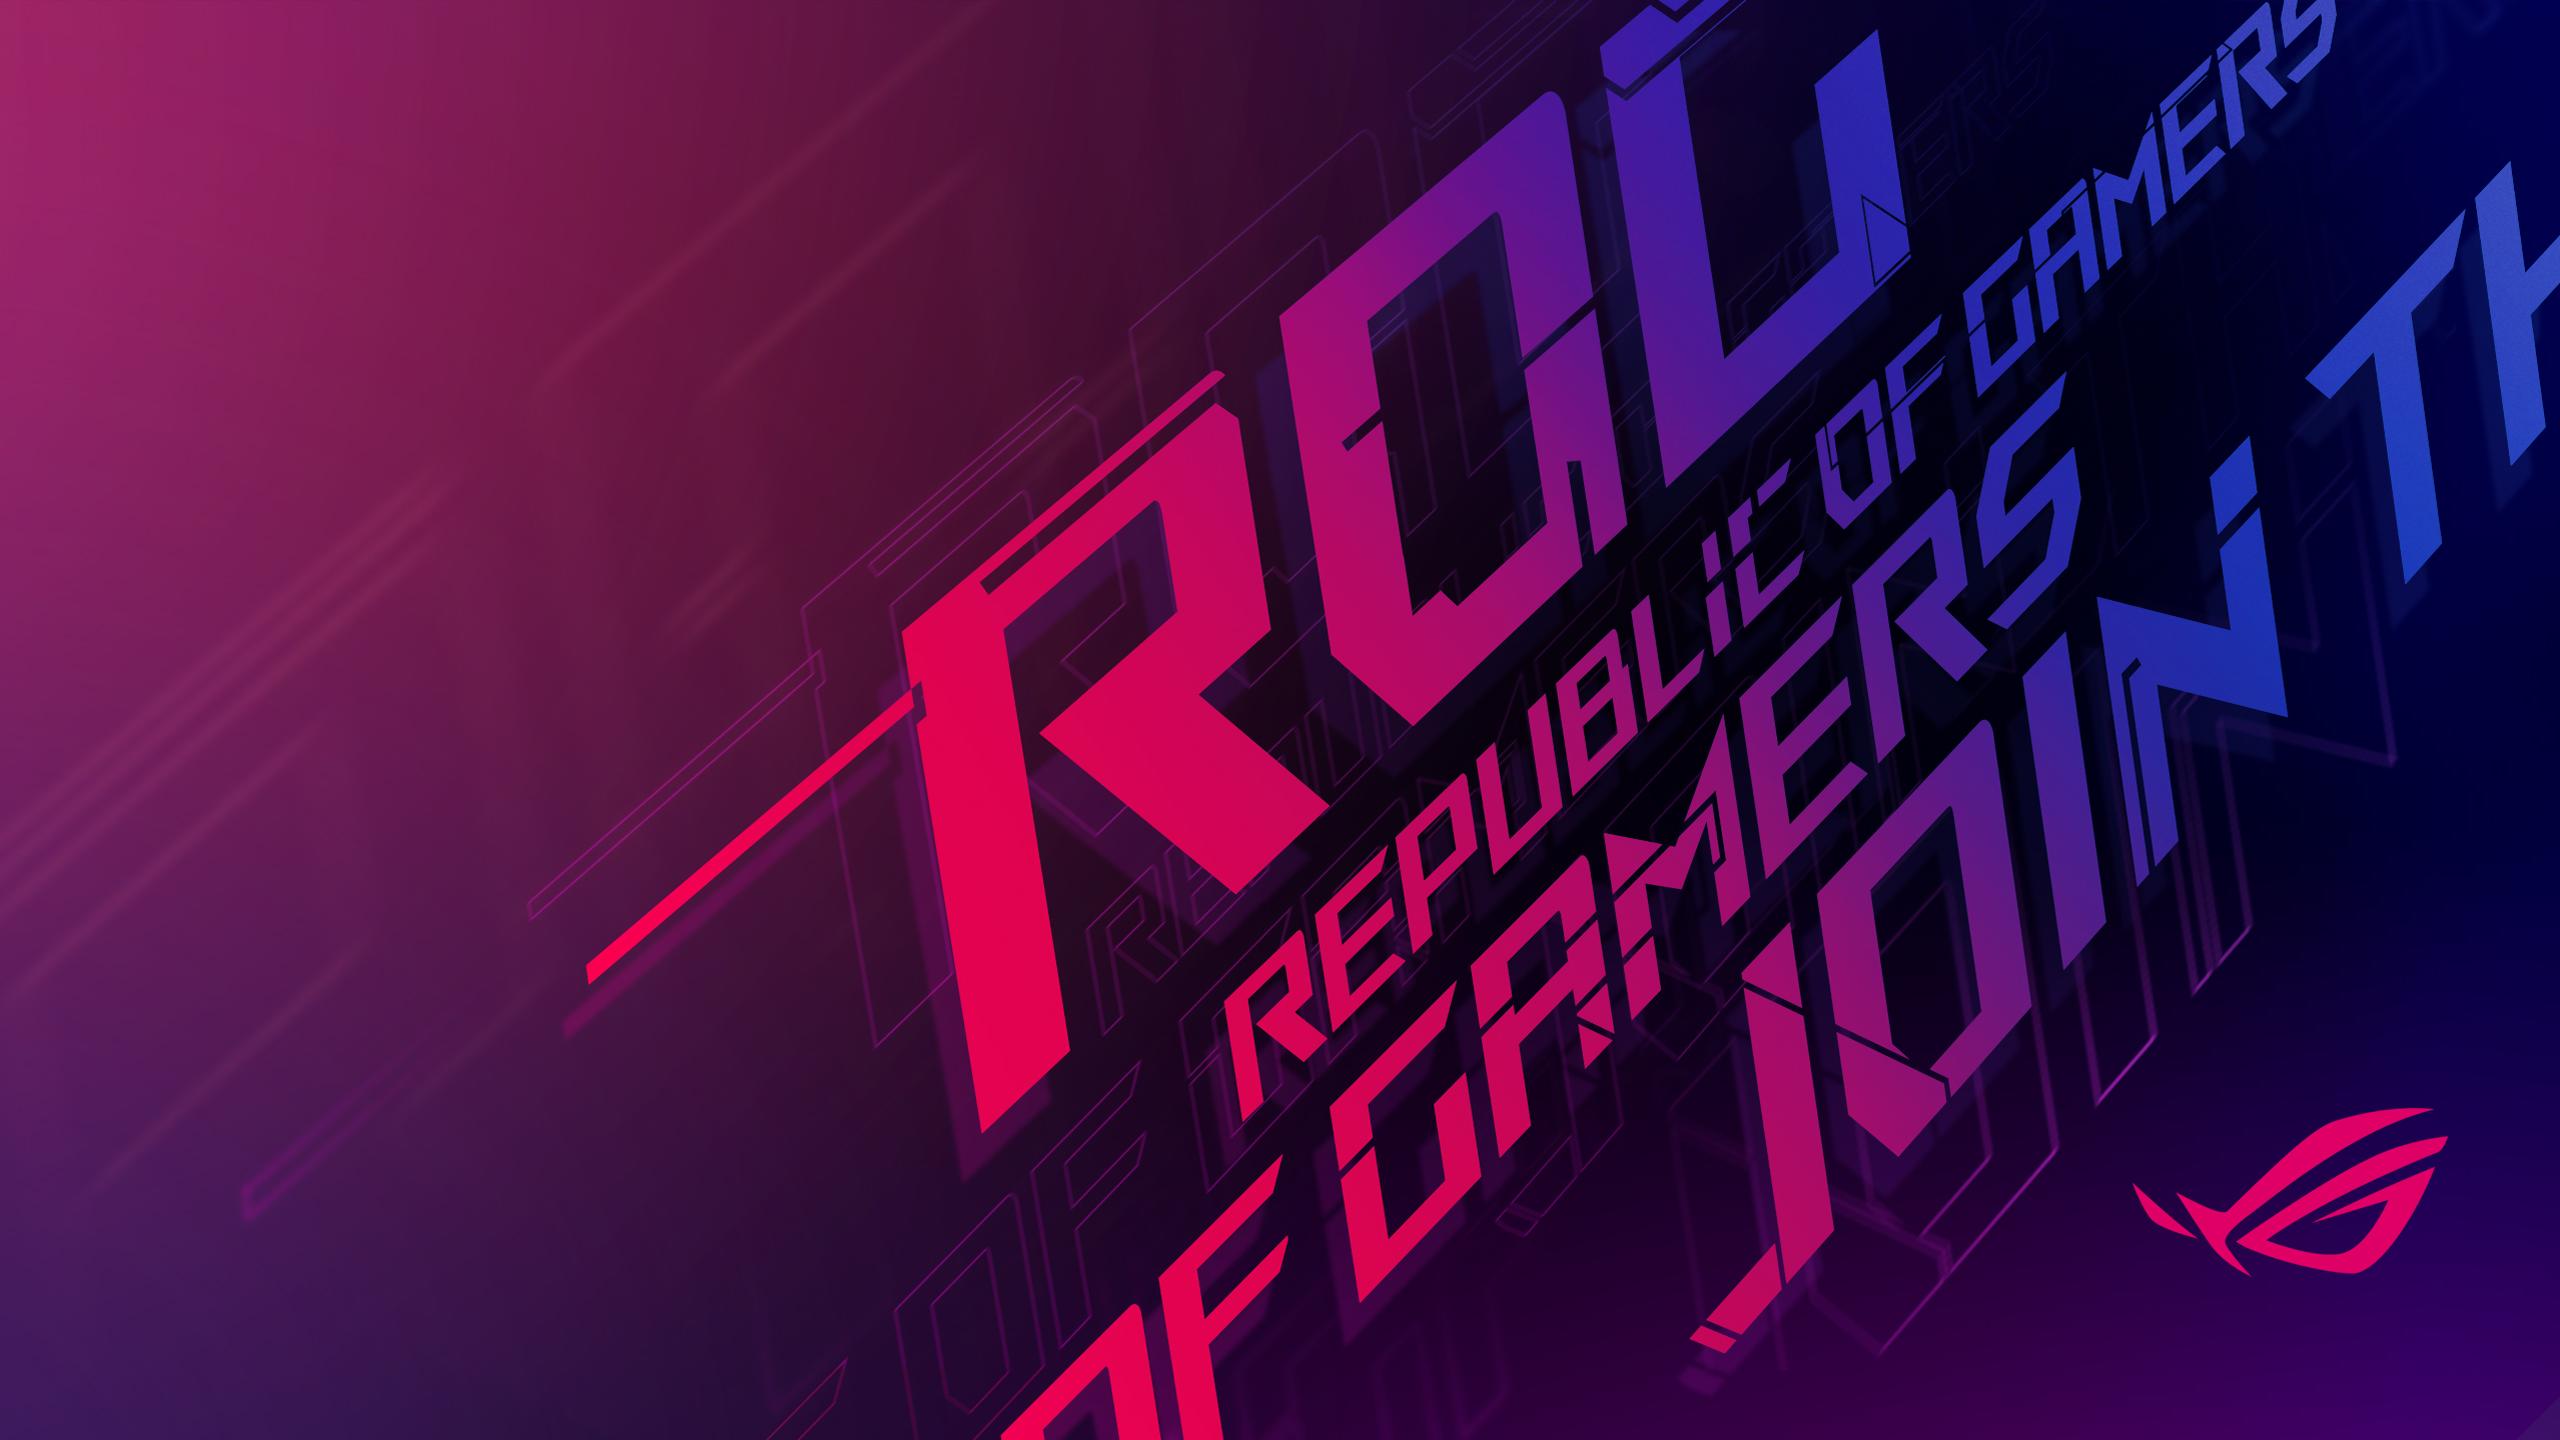 ROG Strix 2019